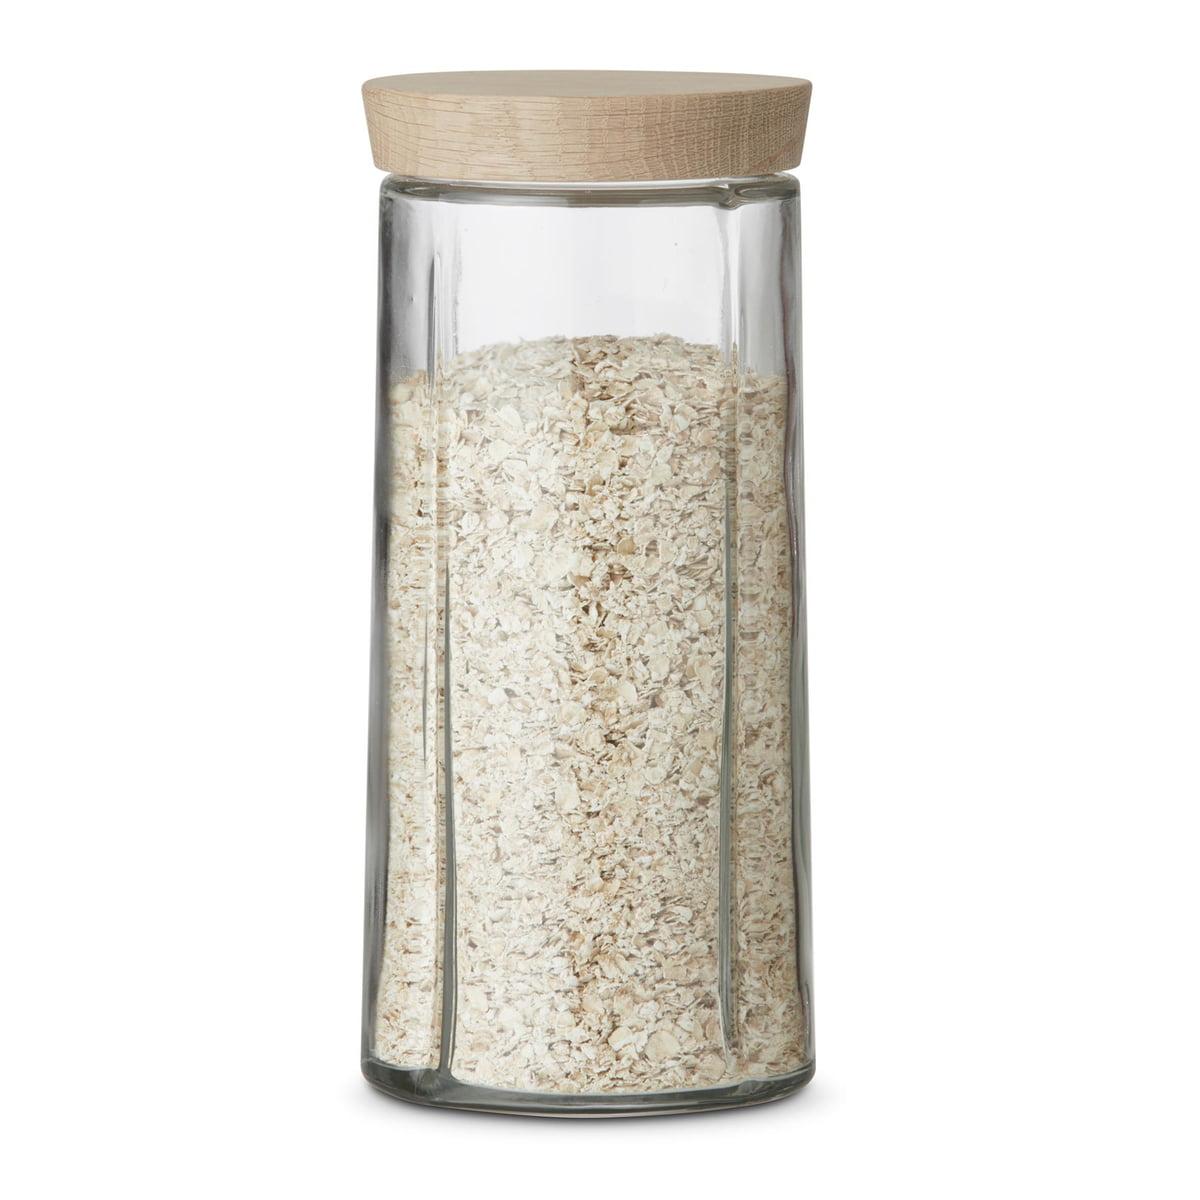 Rosendahl - Grand Cru bocaux en verre / chêne, 1,5 litre